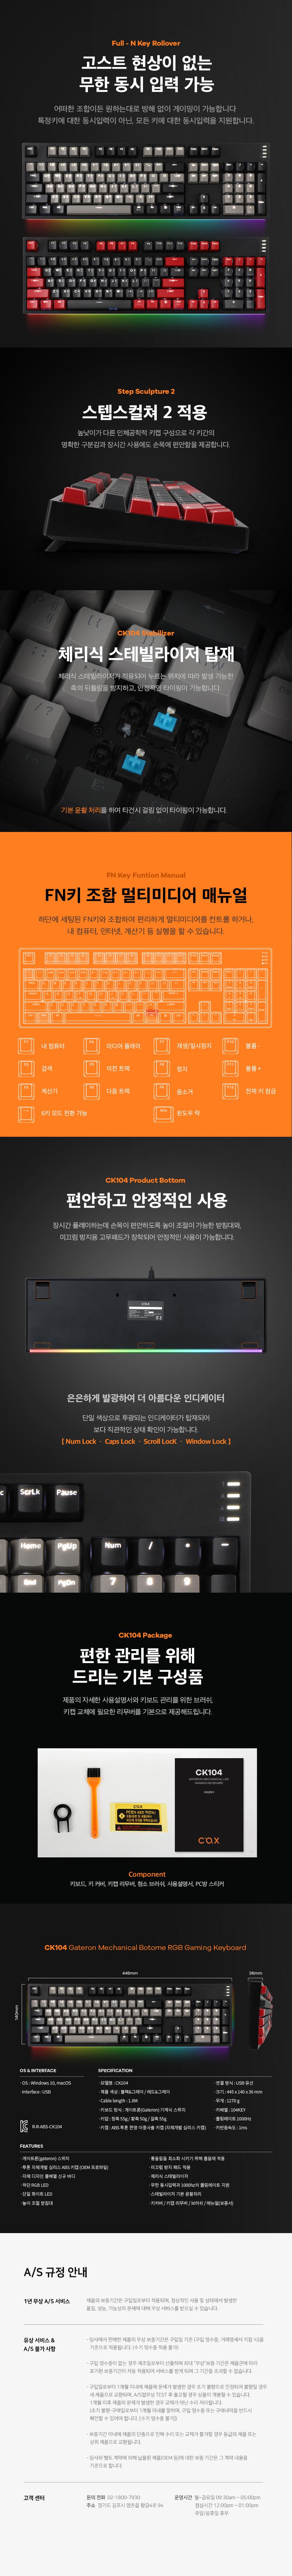 COX CK104 RGB BAR 투톤 이중사출 게이트론 기계식 (블랙그레이, 청축)